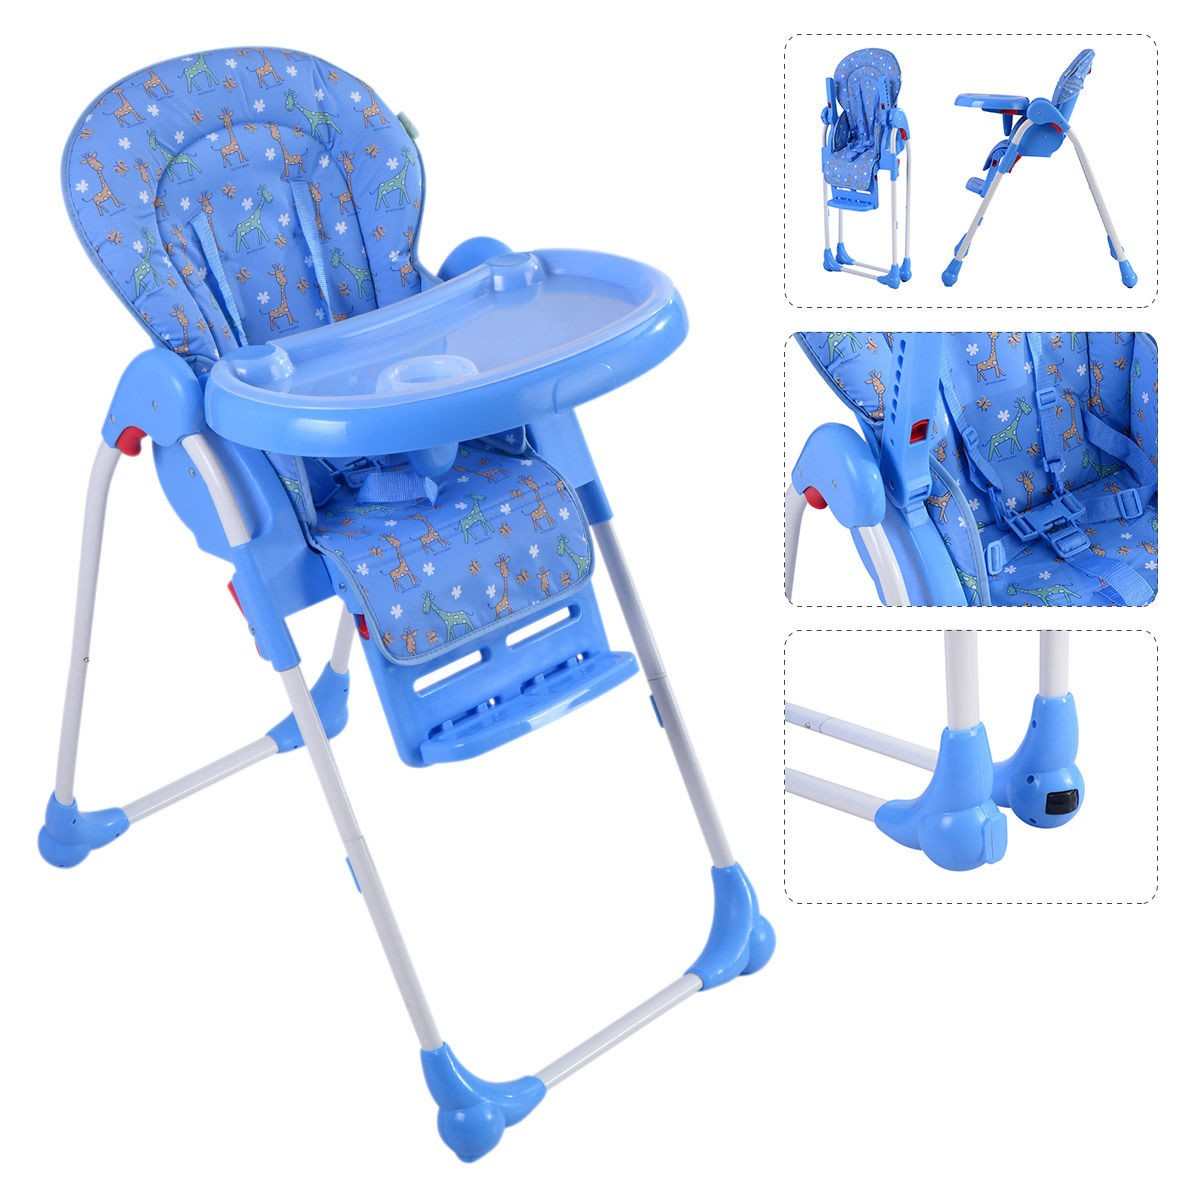 Baby Booster Seats - Walmart.com